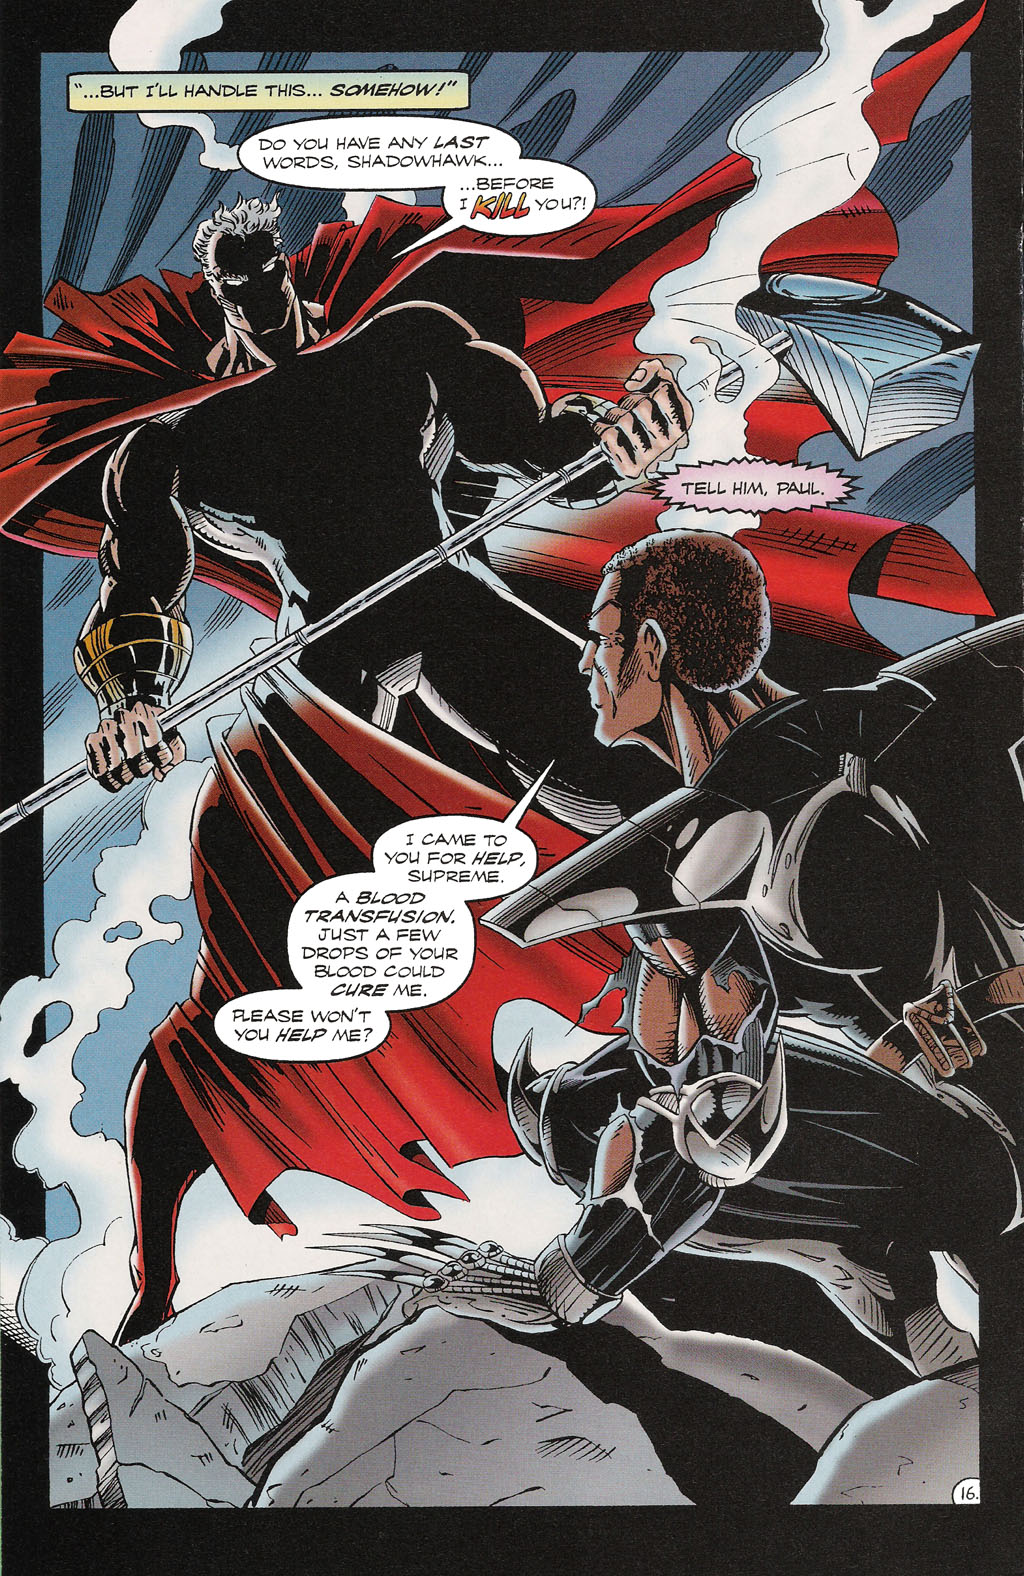 Read online ShadowHawk comic -  Issue #16 - 15